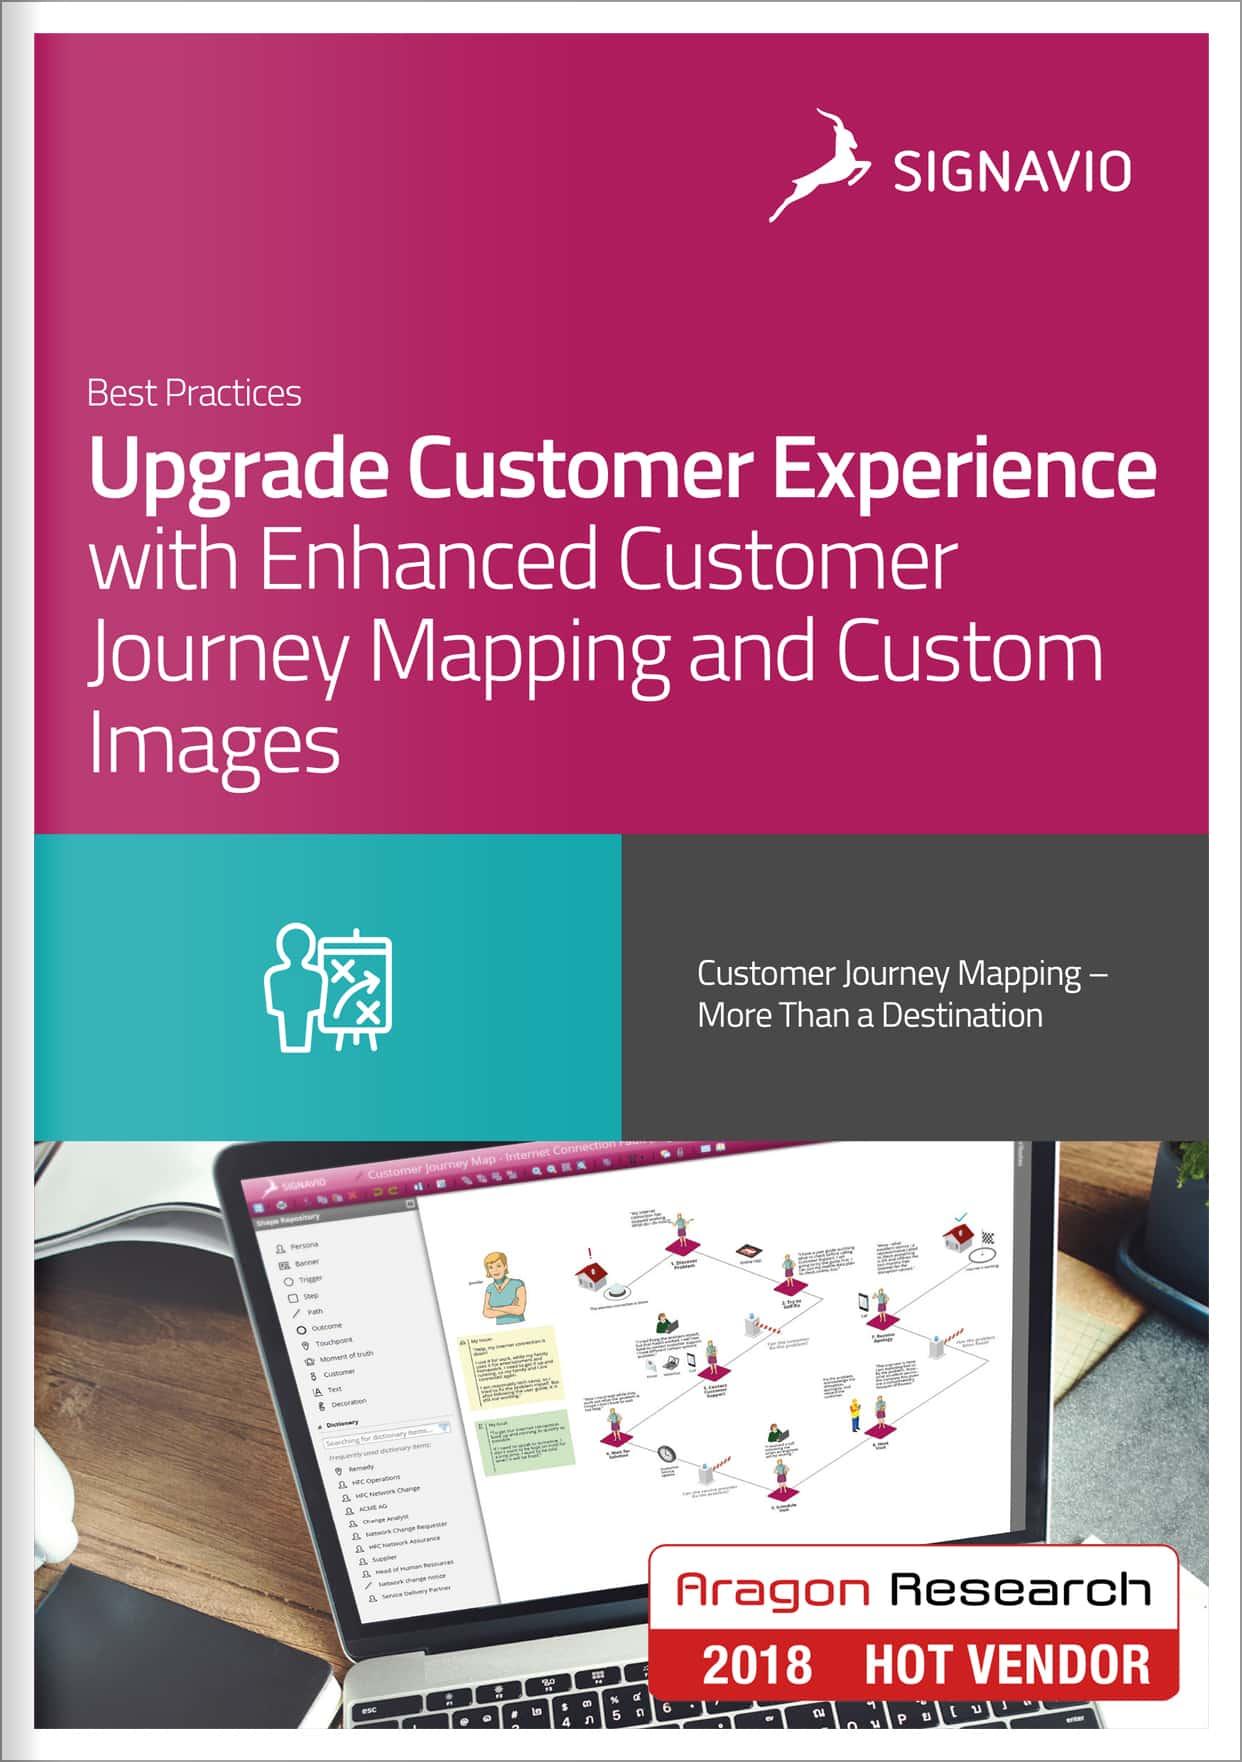 Signavio Customer Journey Mapping